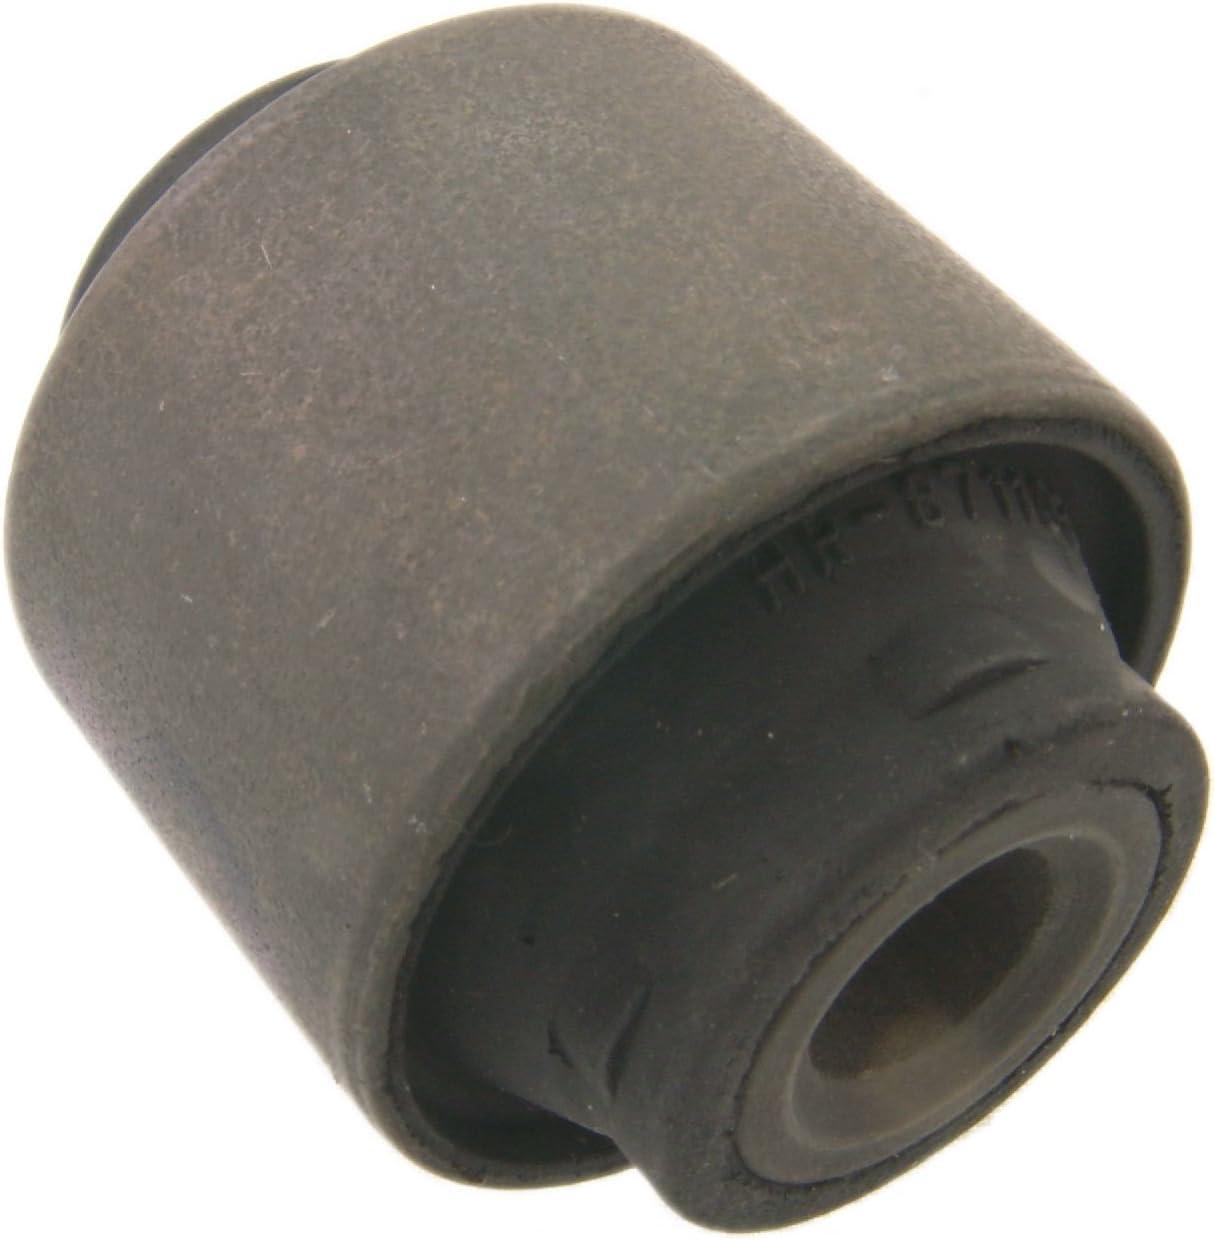 "Speedflow 3//8/"" 10mm Barb to Metric M12 x 1.5 Push On Hose Fitting 414-M12-06"